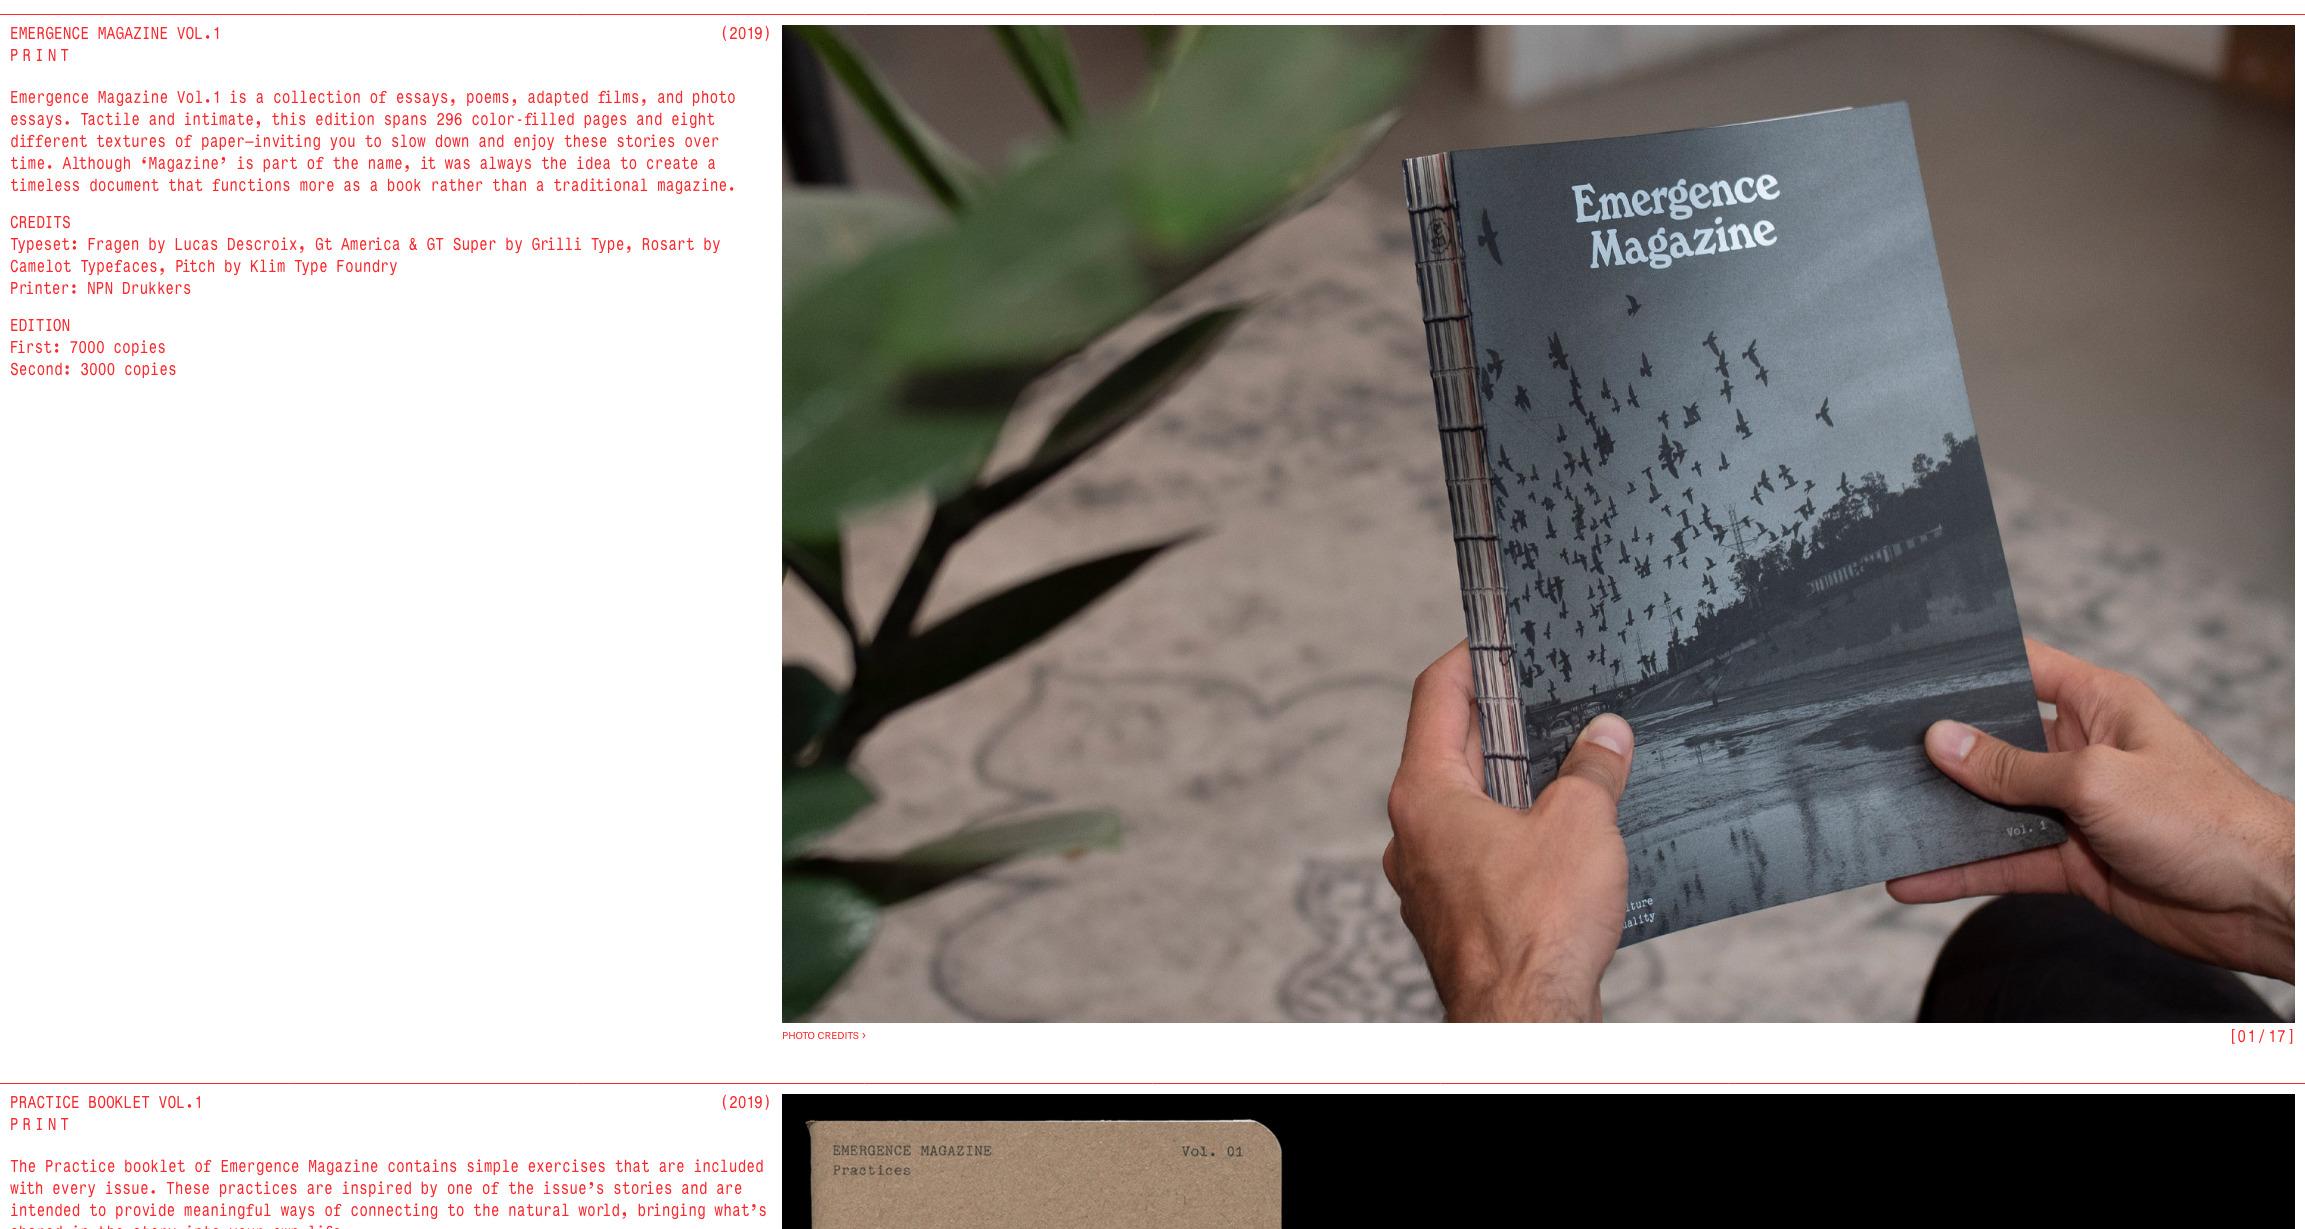 images/2.jpg